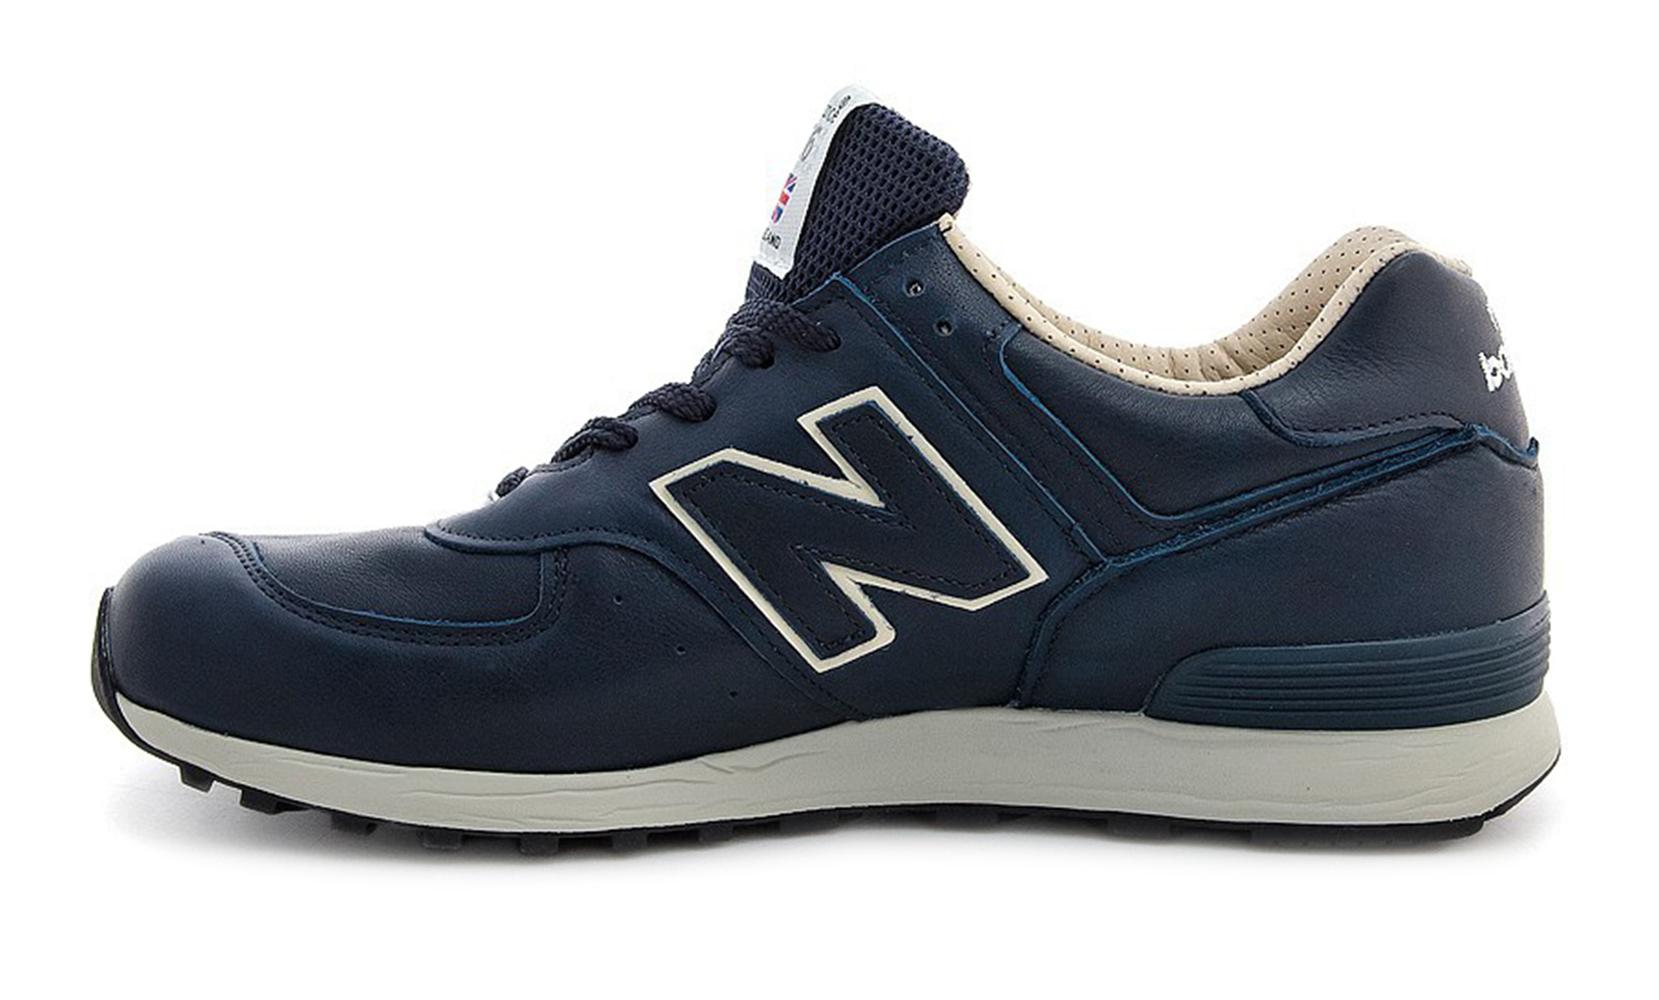 Чоловіче взуття повсякденне 576 Made in UK M576CNN | New Balance